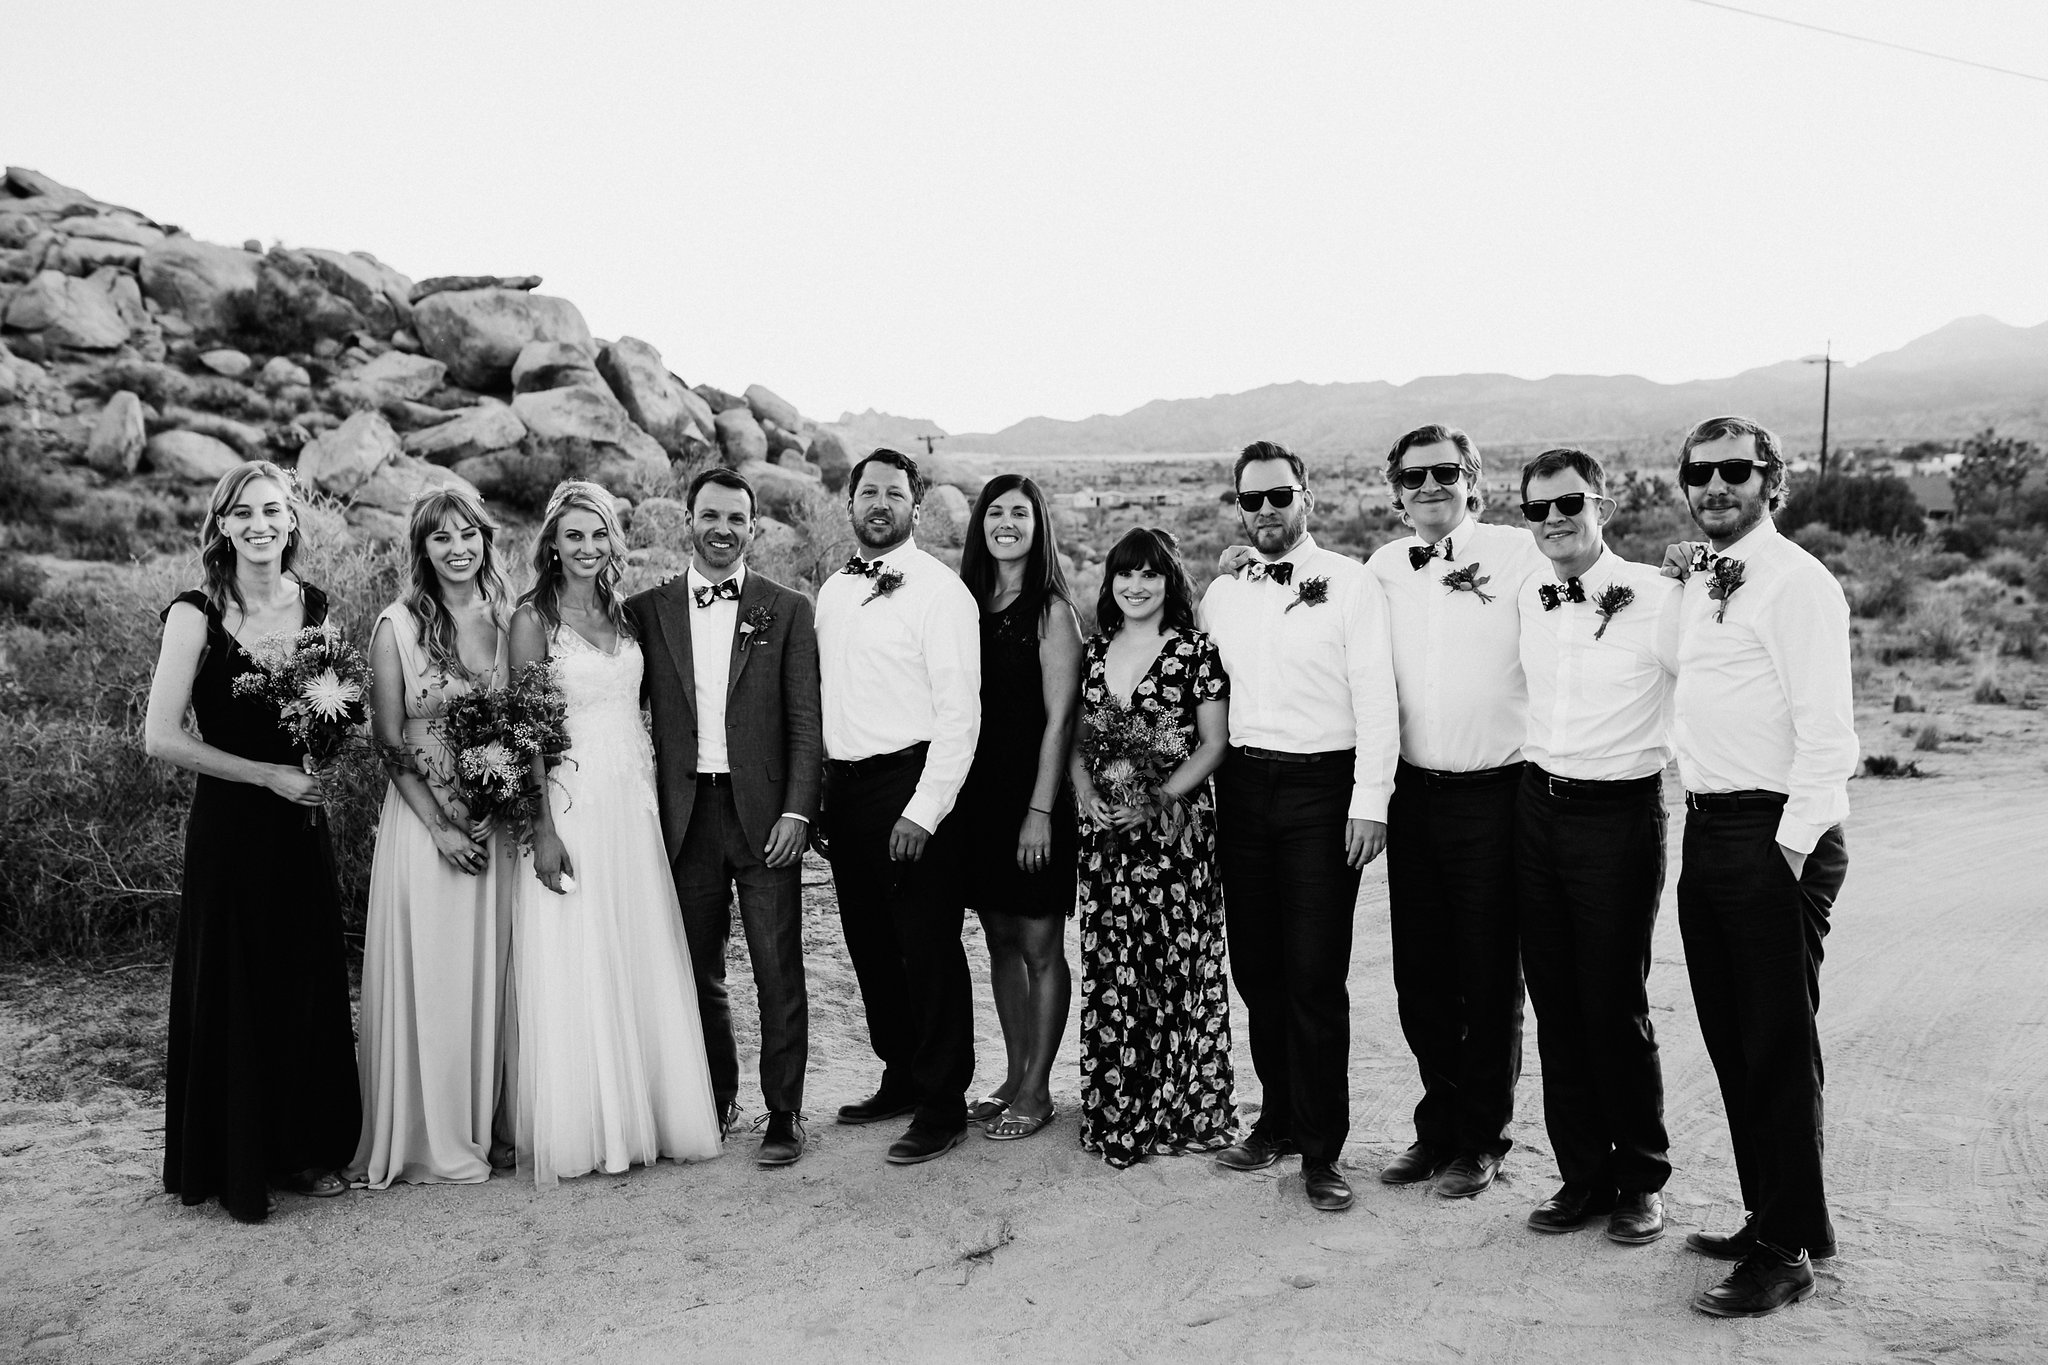 sb-091716-weddingparty-002.jpg